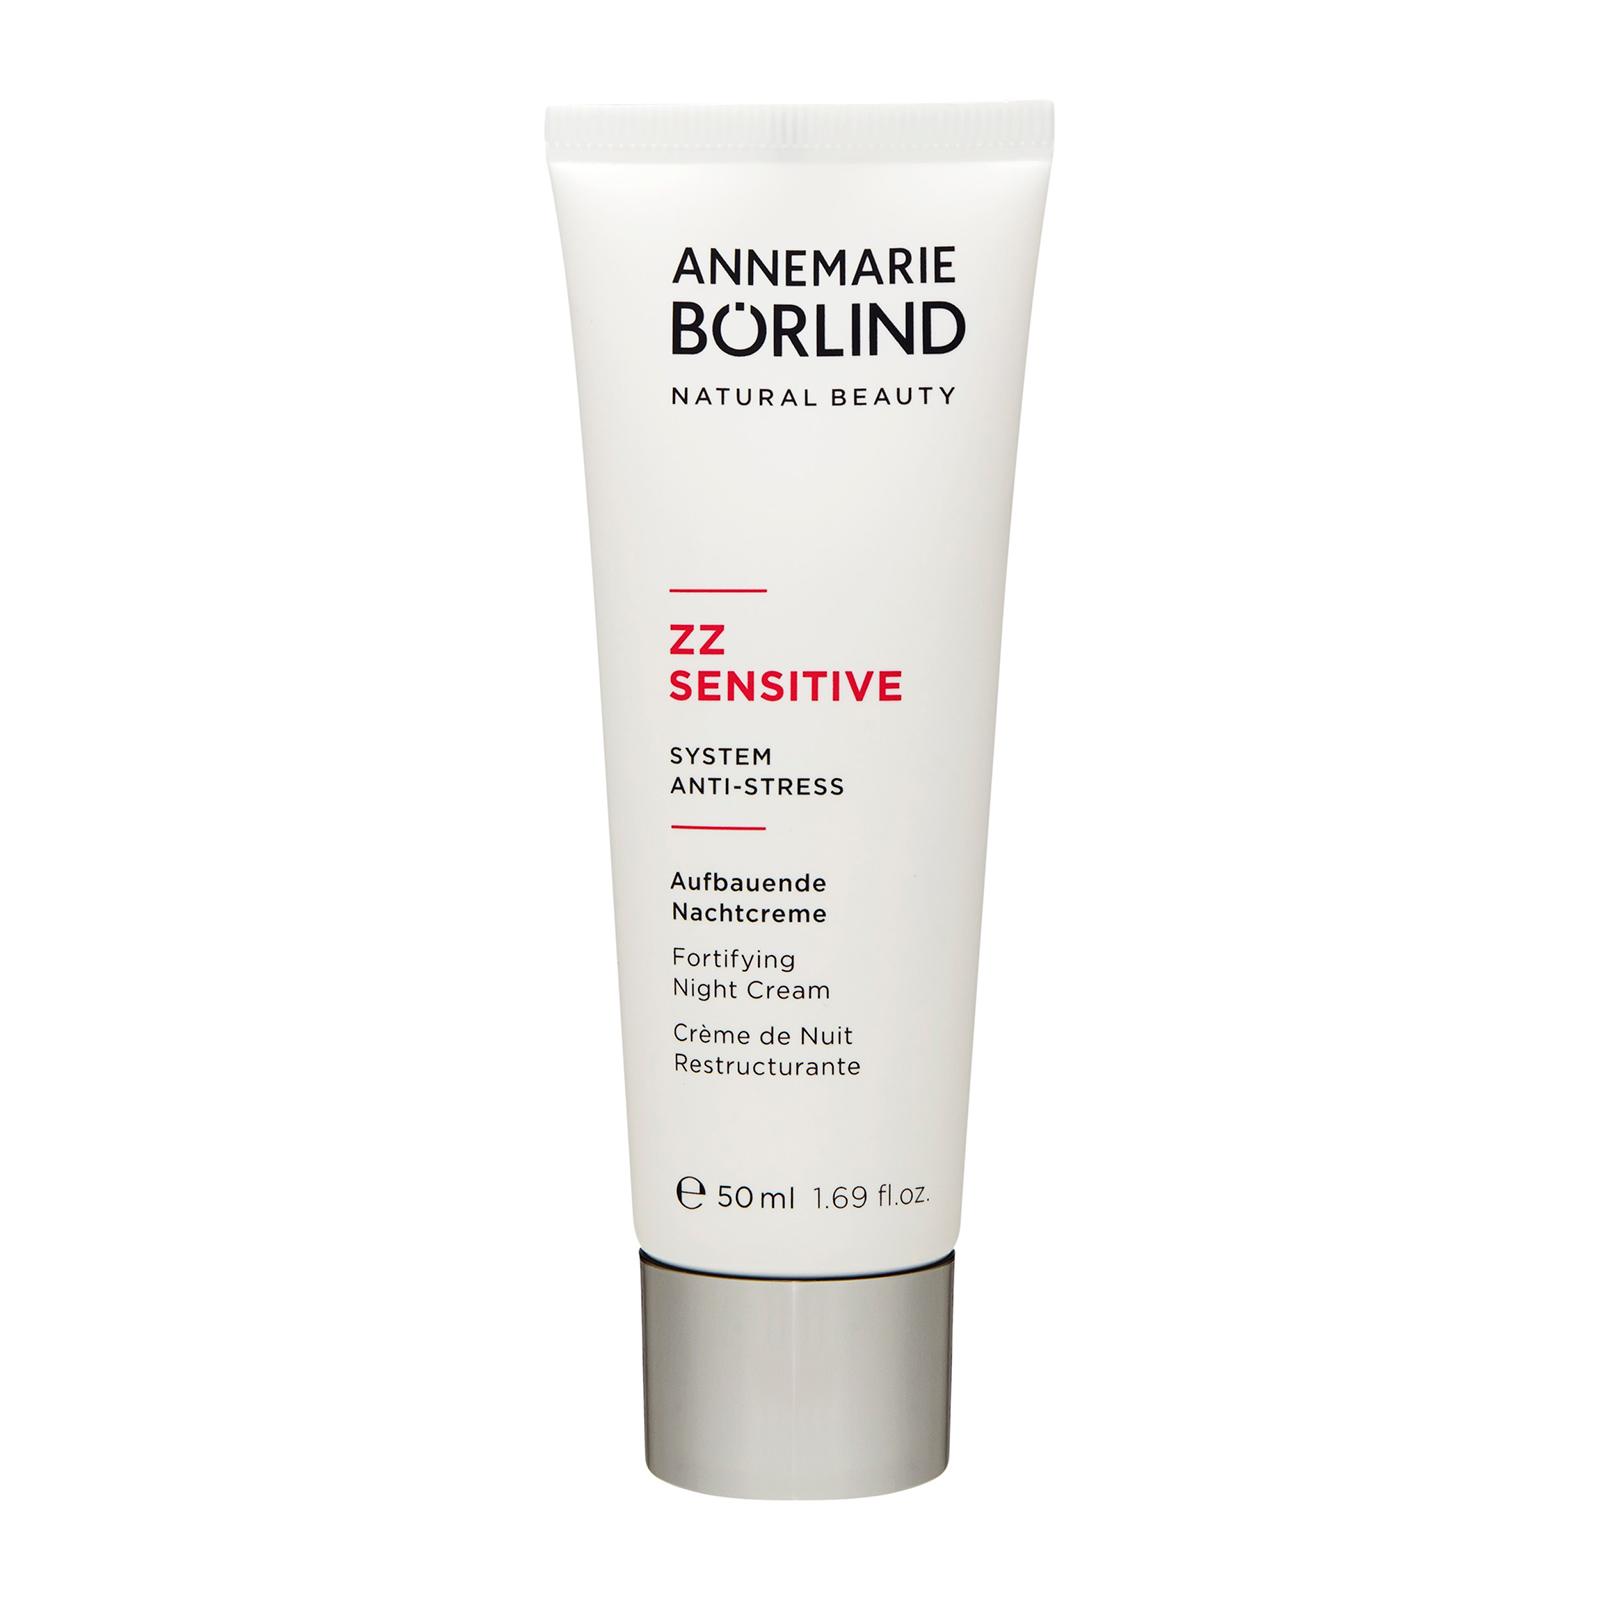 Annemarie Borlind ZZ Sensitive Fortifying Night Cream 1.69oz, 50ml